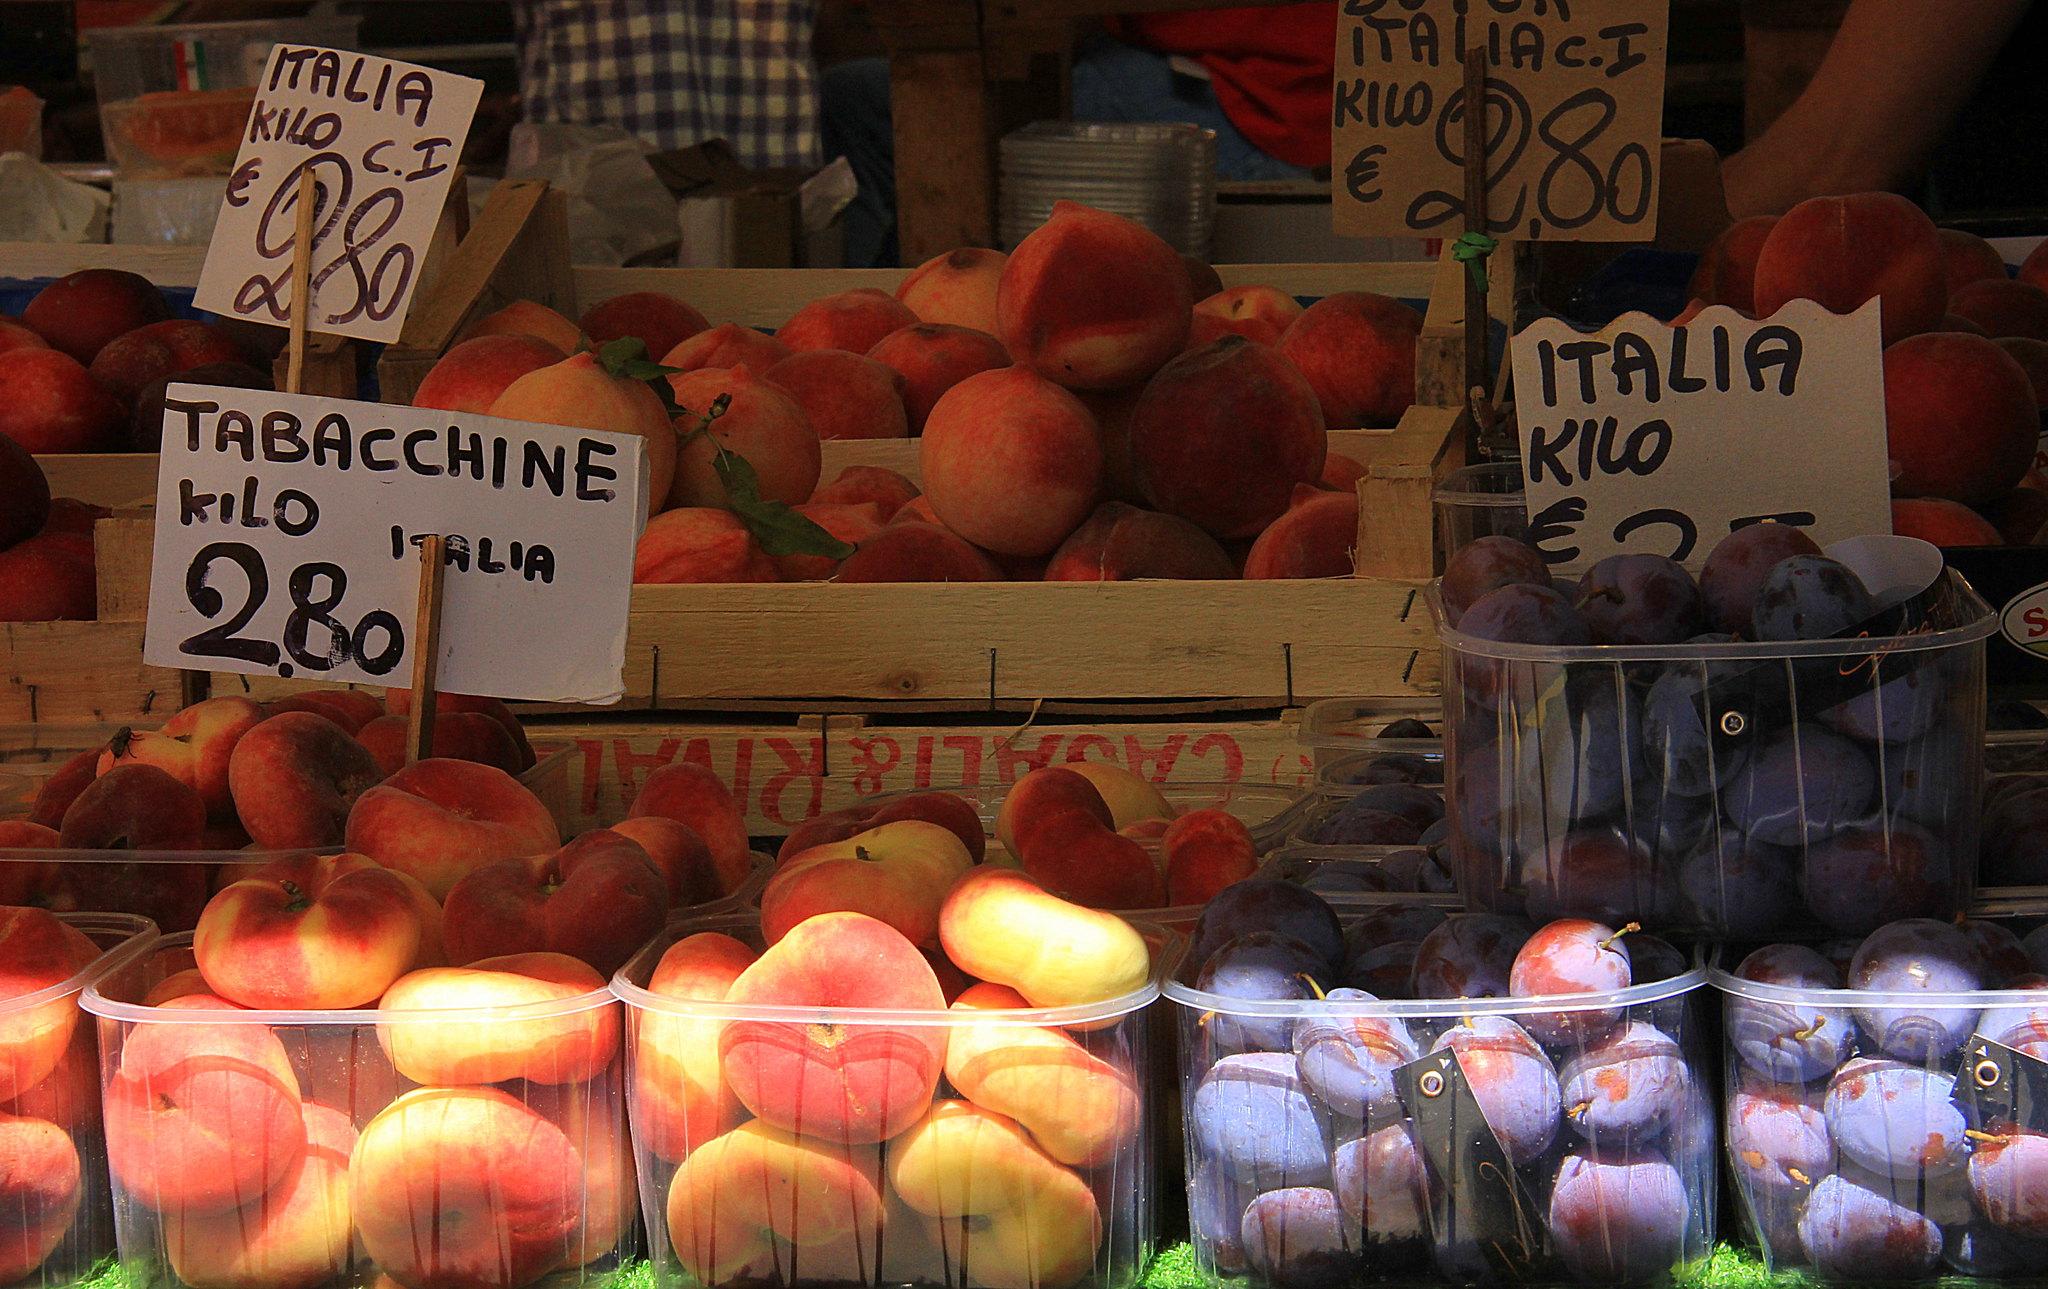 Fruits are also sold at Erberia at the Rialto Markets in Venice